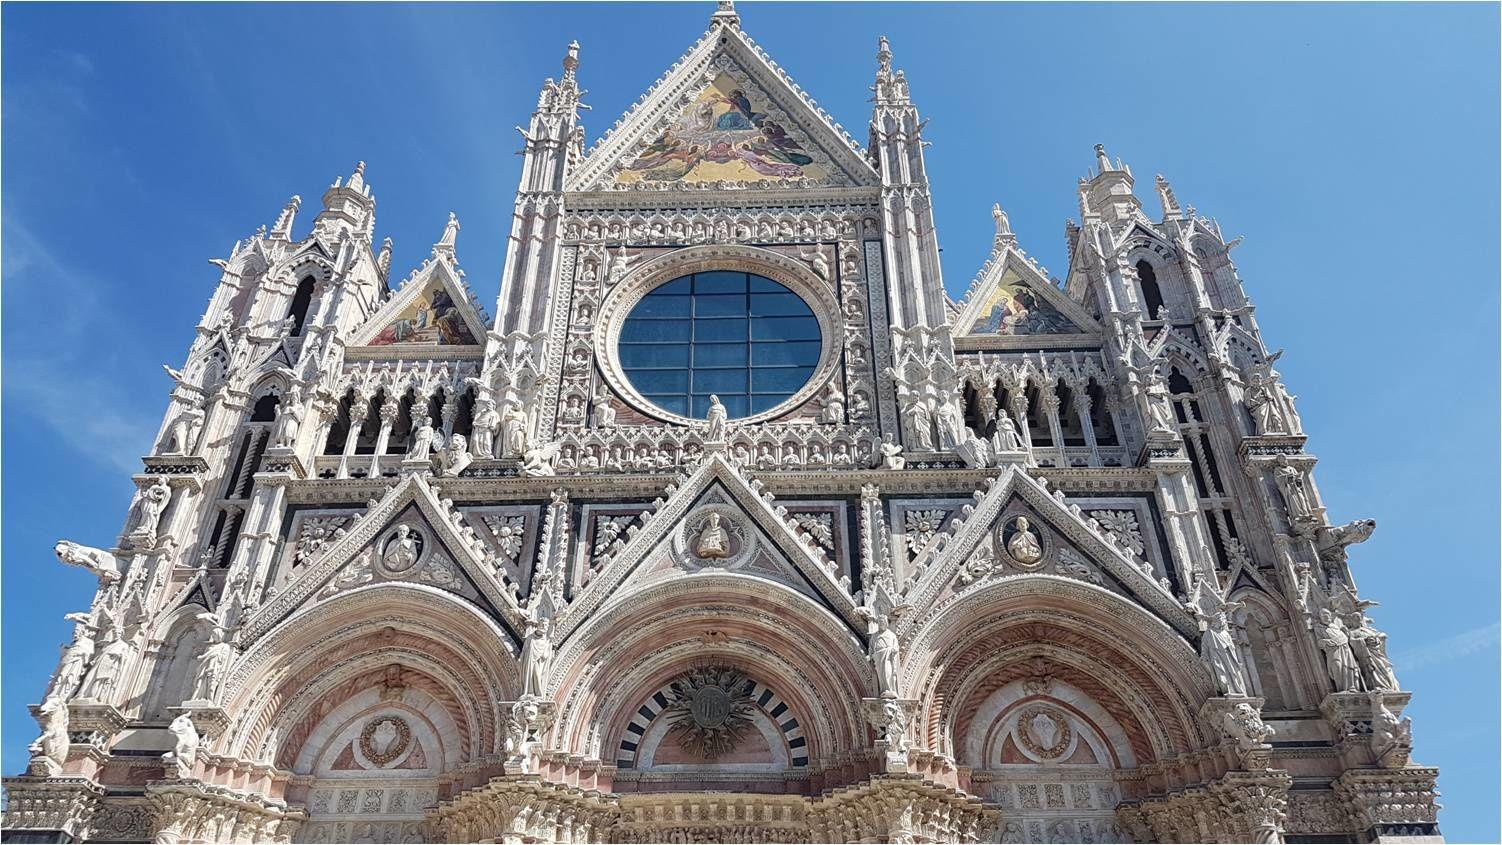 Italie 2017 - Instantané 92